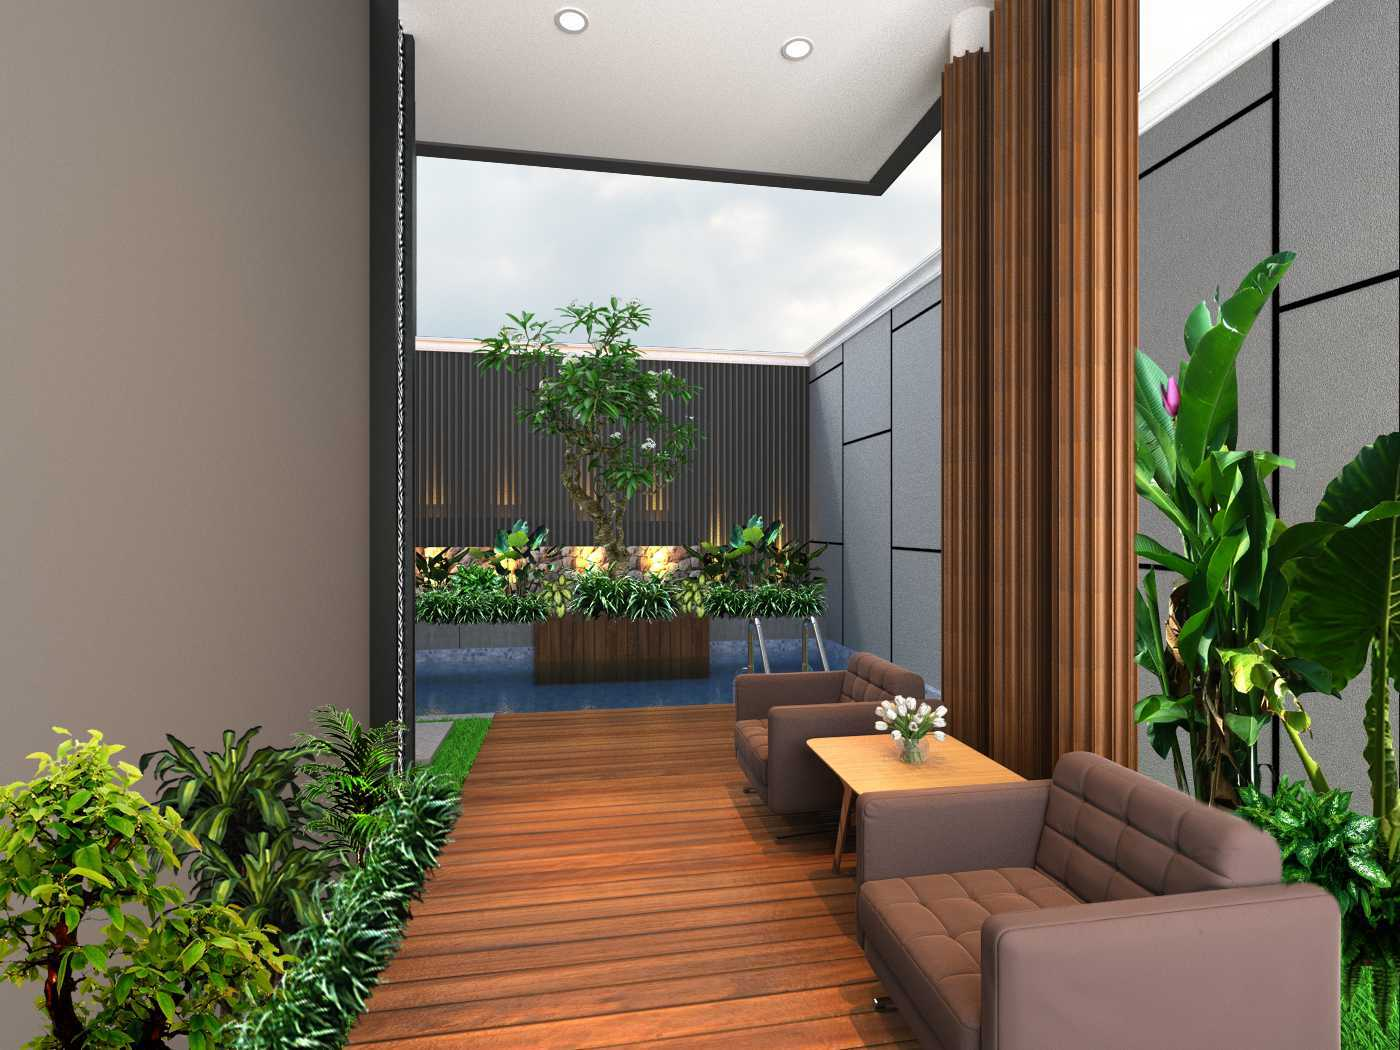 Sense Studio Residence - Surabaya Surabaya, Kota Sby, Jawa Timur, Indonesia Surabaya, Kota Sby, Jawa Timur, Indonesia Sense-Studio-Rumah-Tinggal-Kertomenanggal  51654